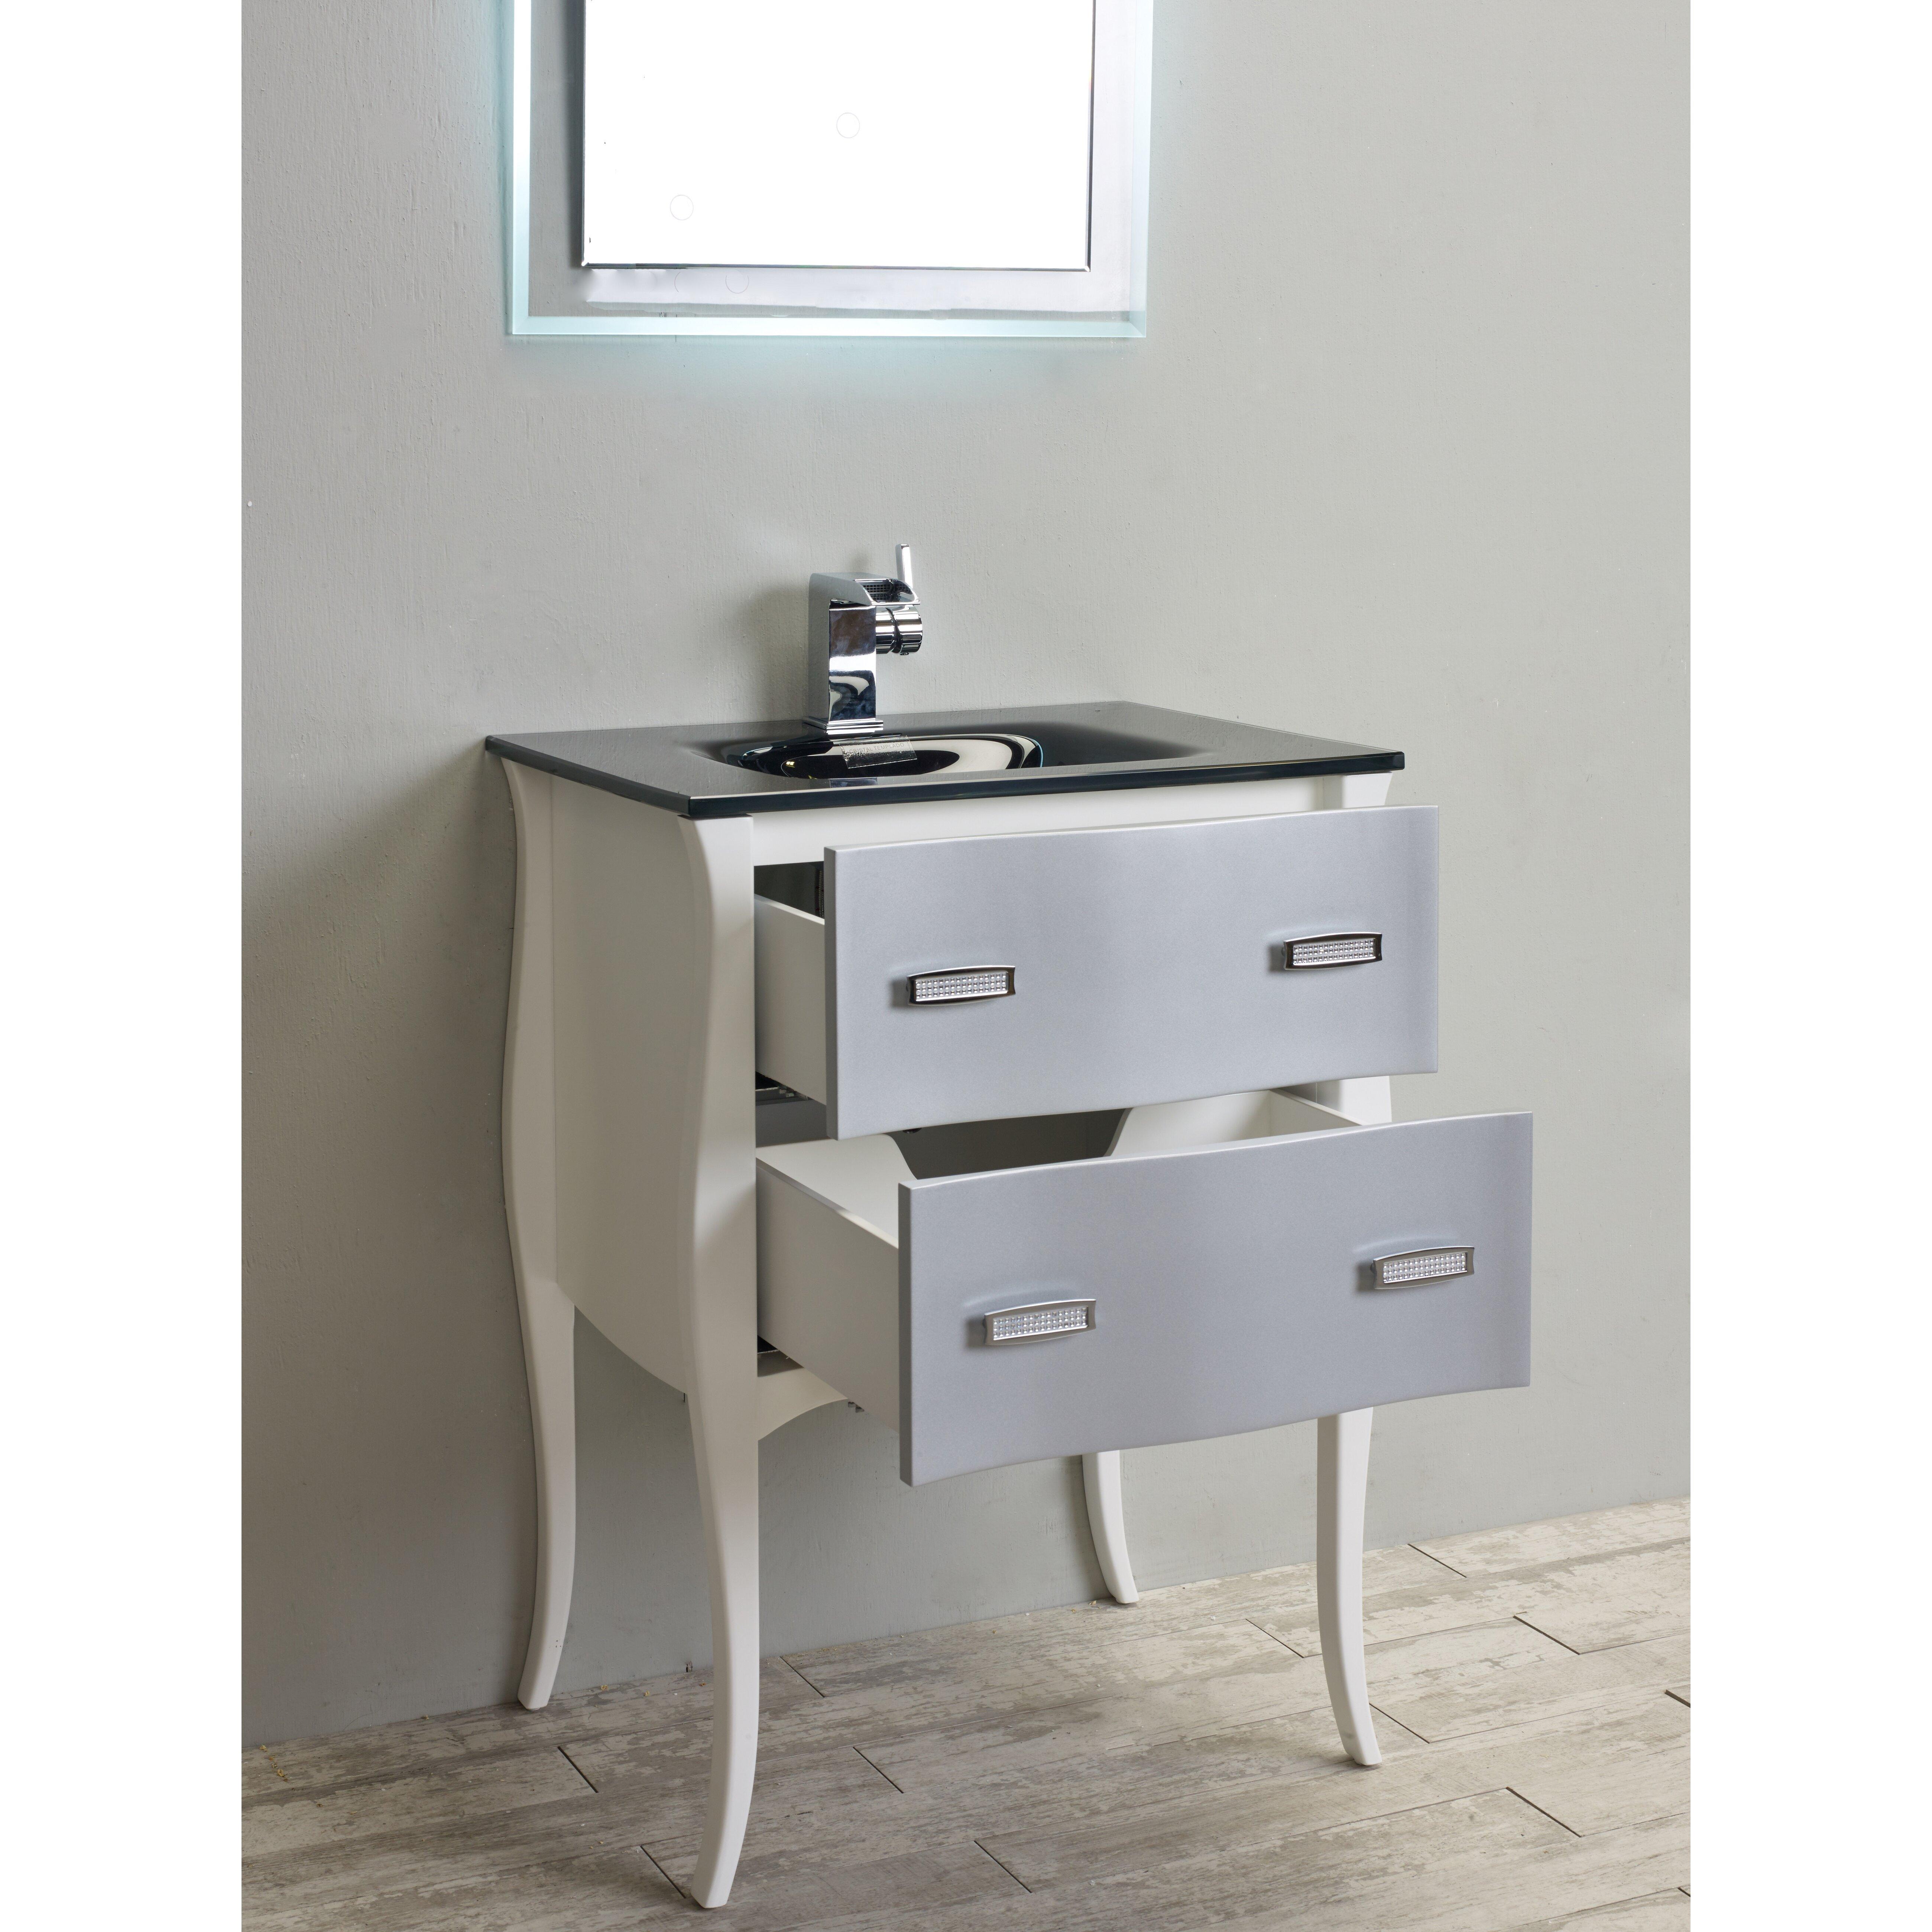 "Eviva Aranjuez 24"" Single Bathroom Vanity Set & Reviews"